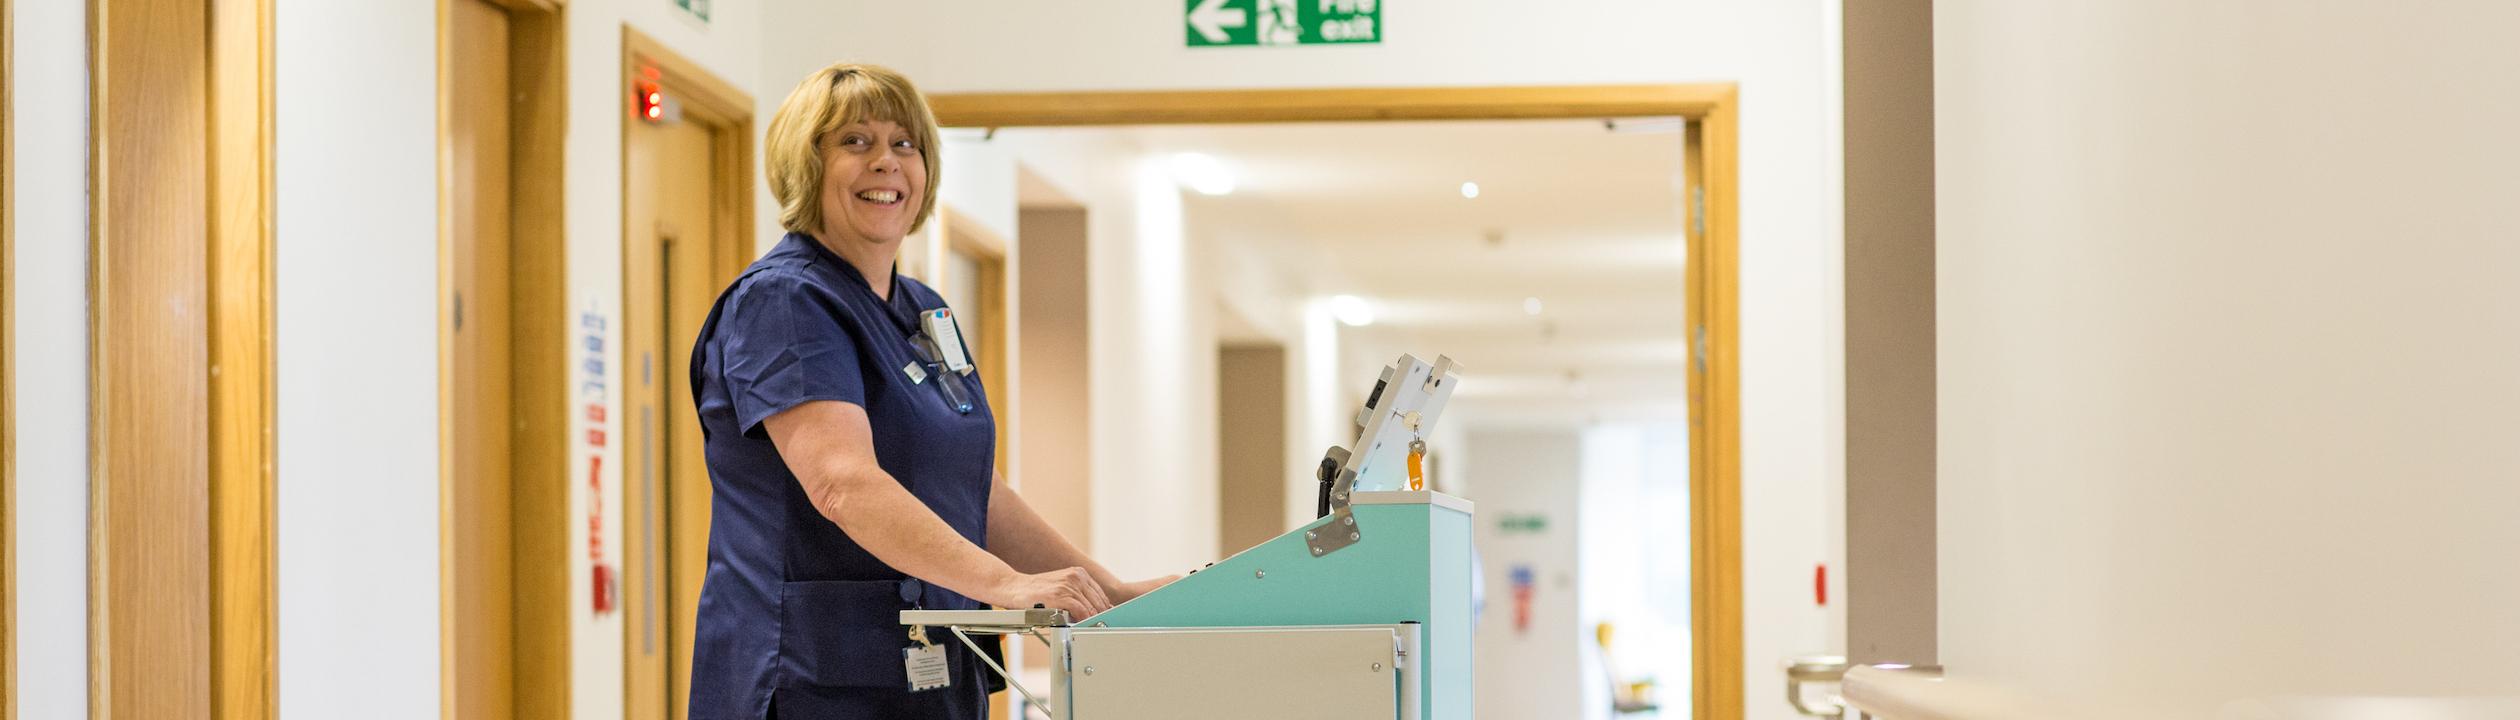 sister on kims hospital nickleby ward